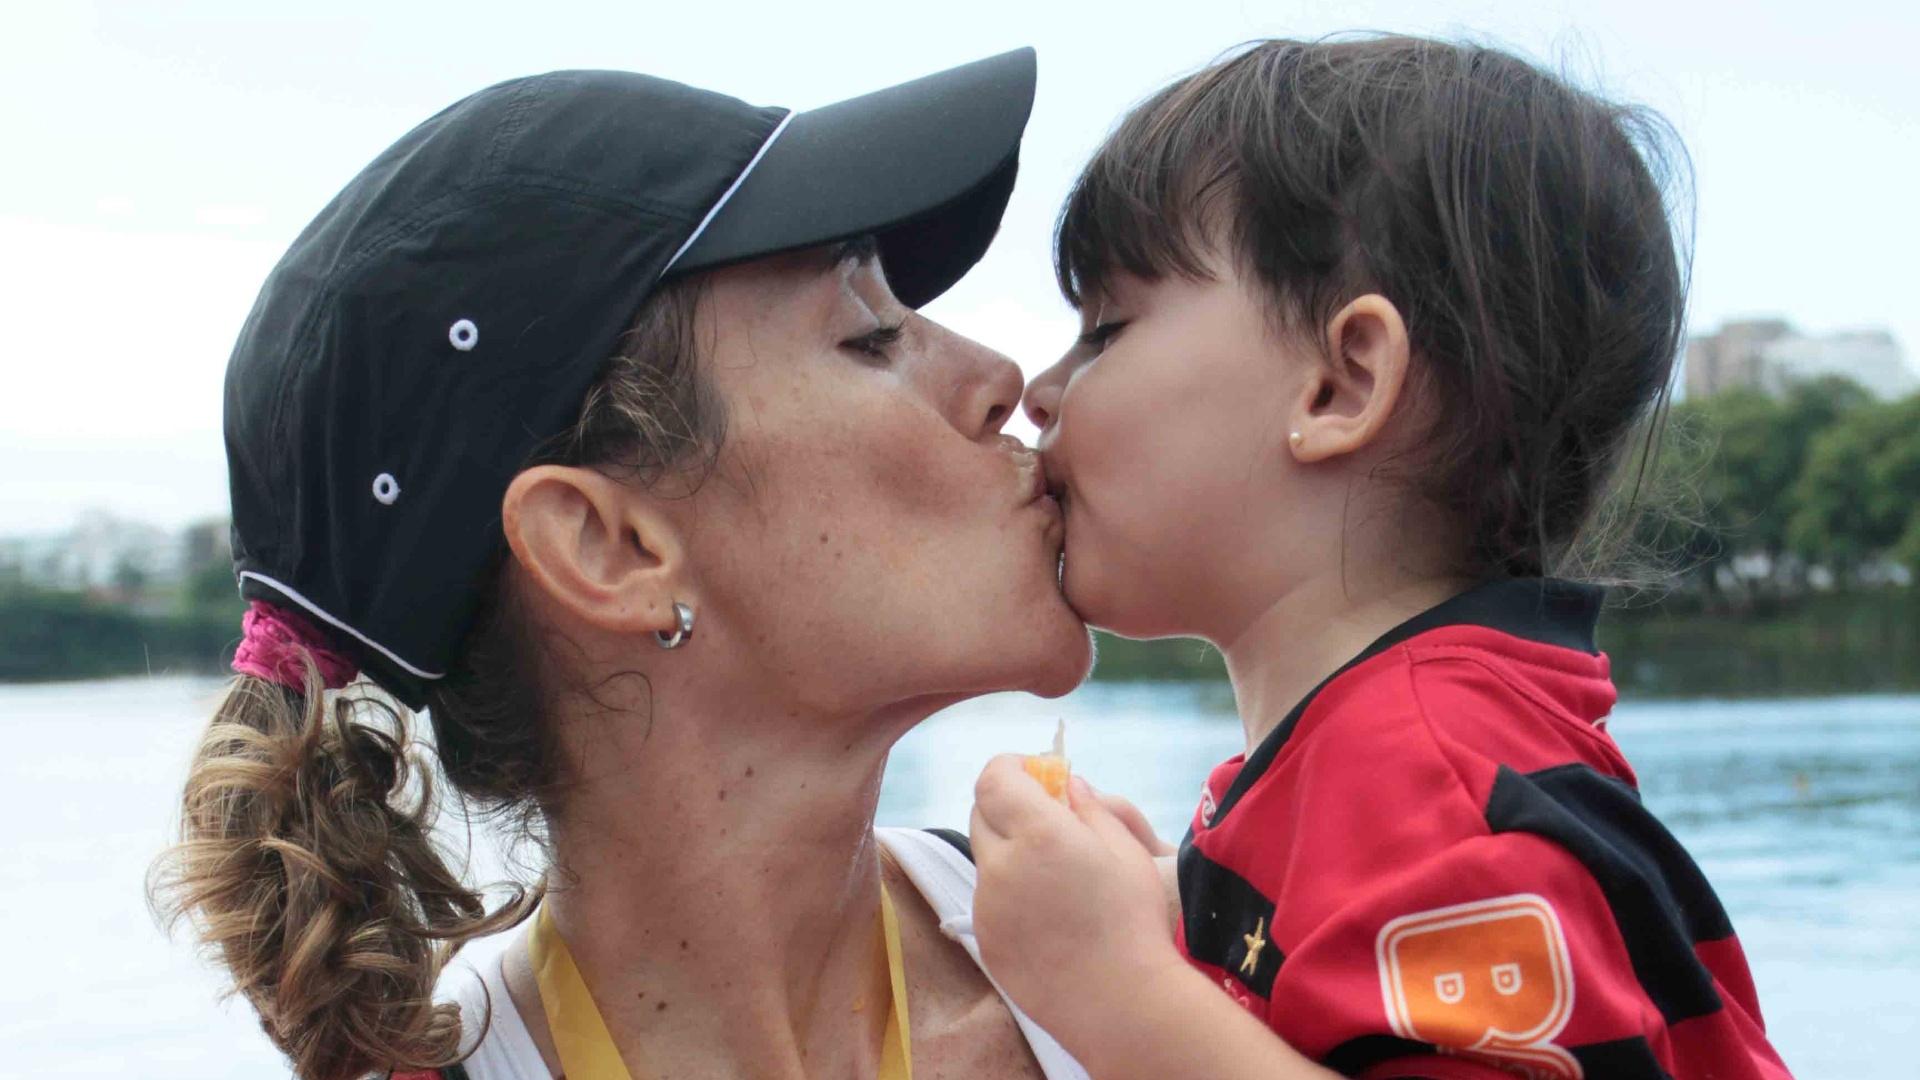 Fabiana Beltrame comemora após vencer a Regata Estadual de Remo na categoria single skiff